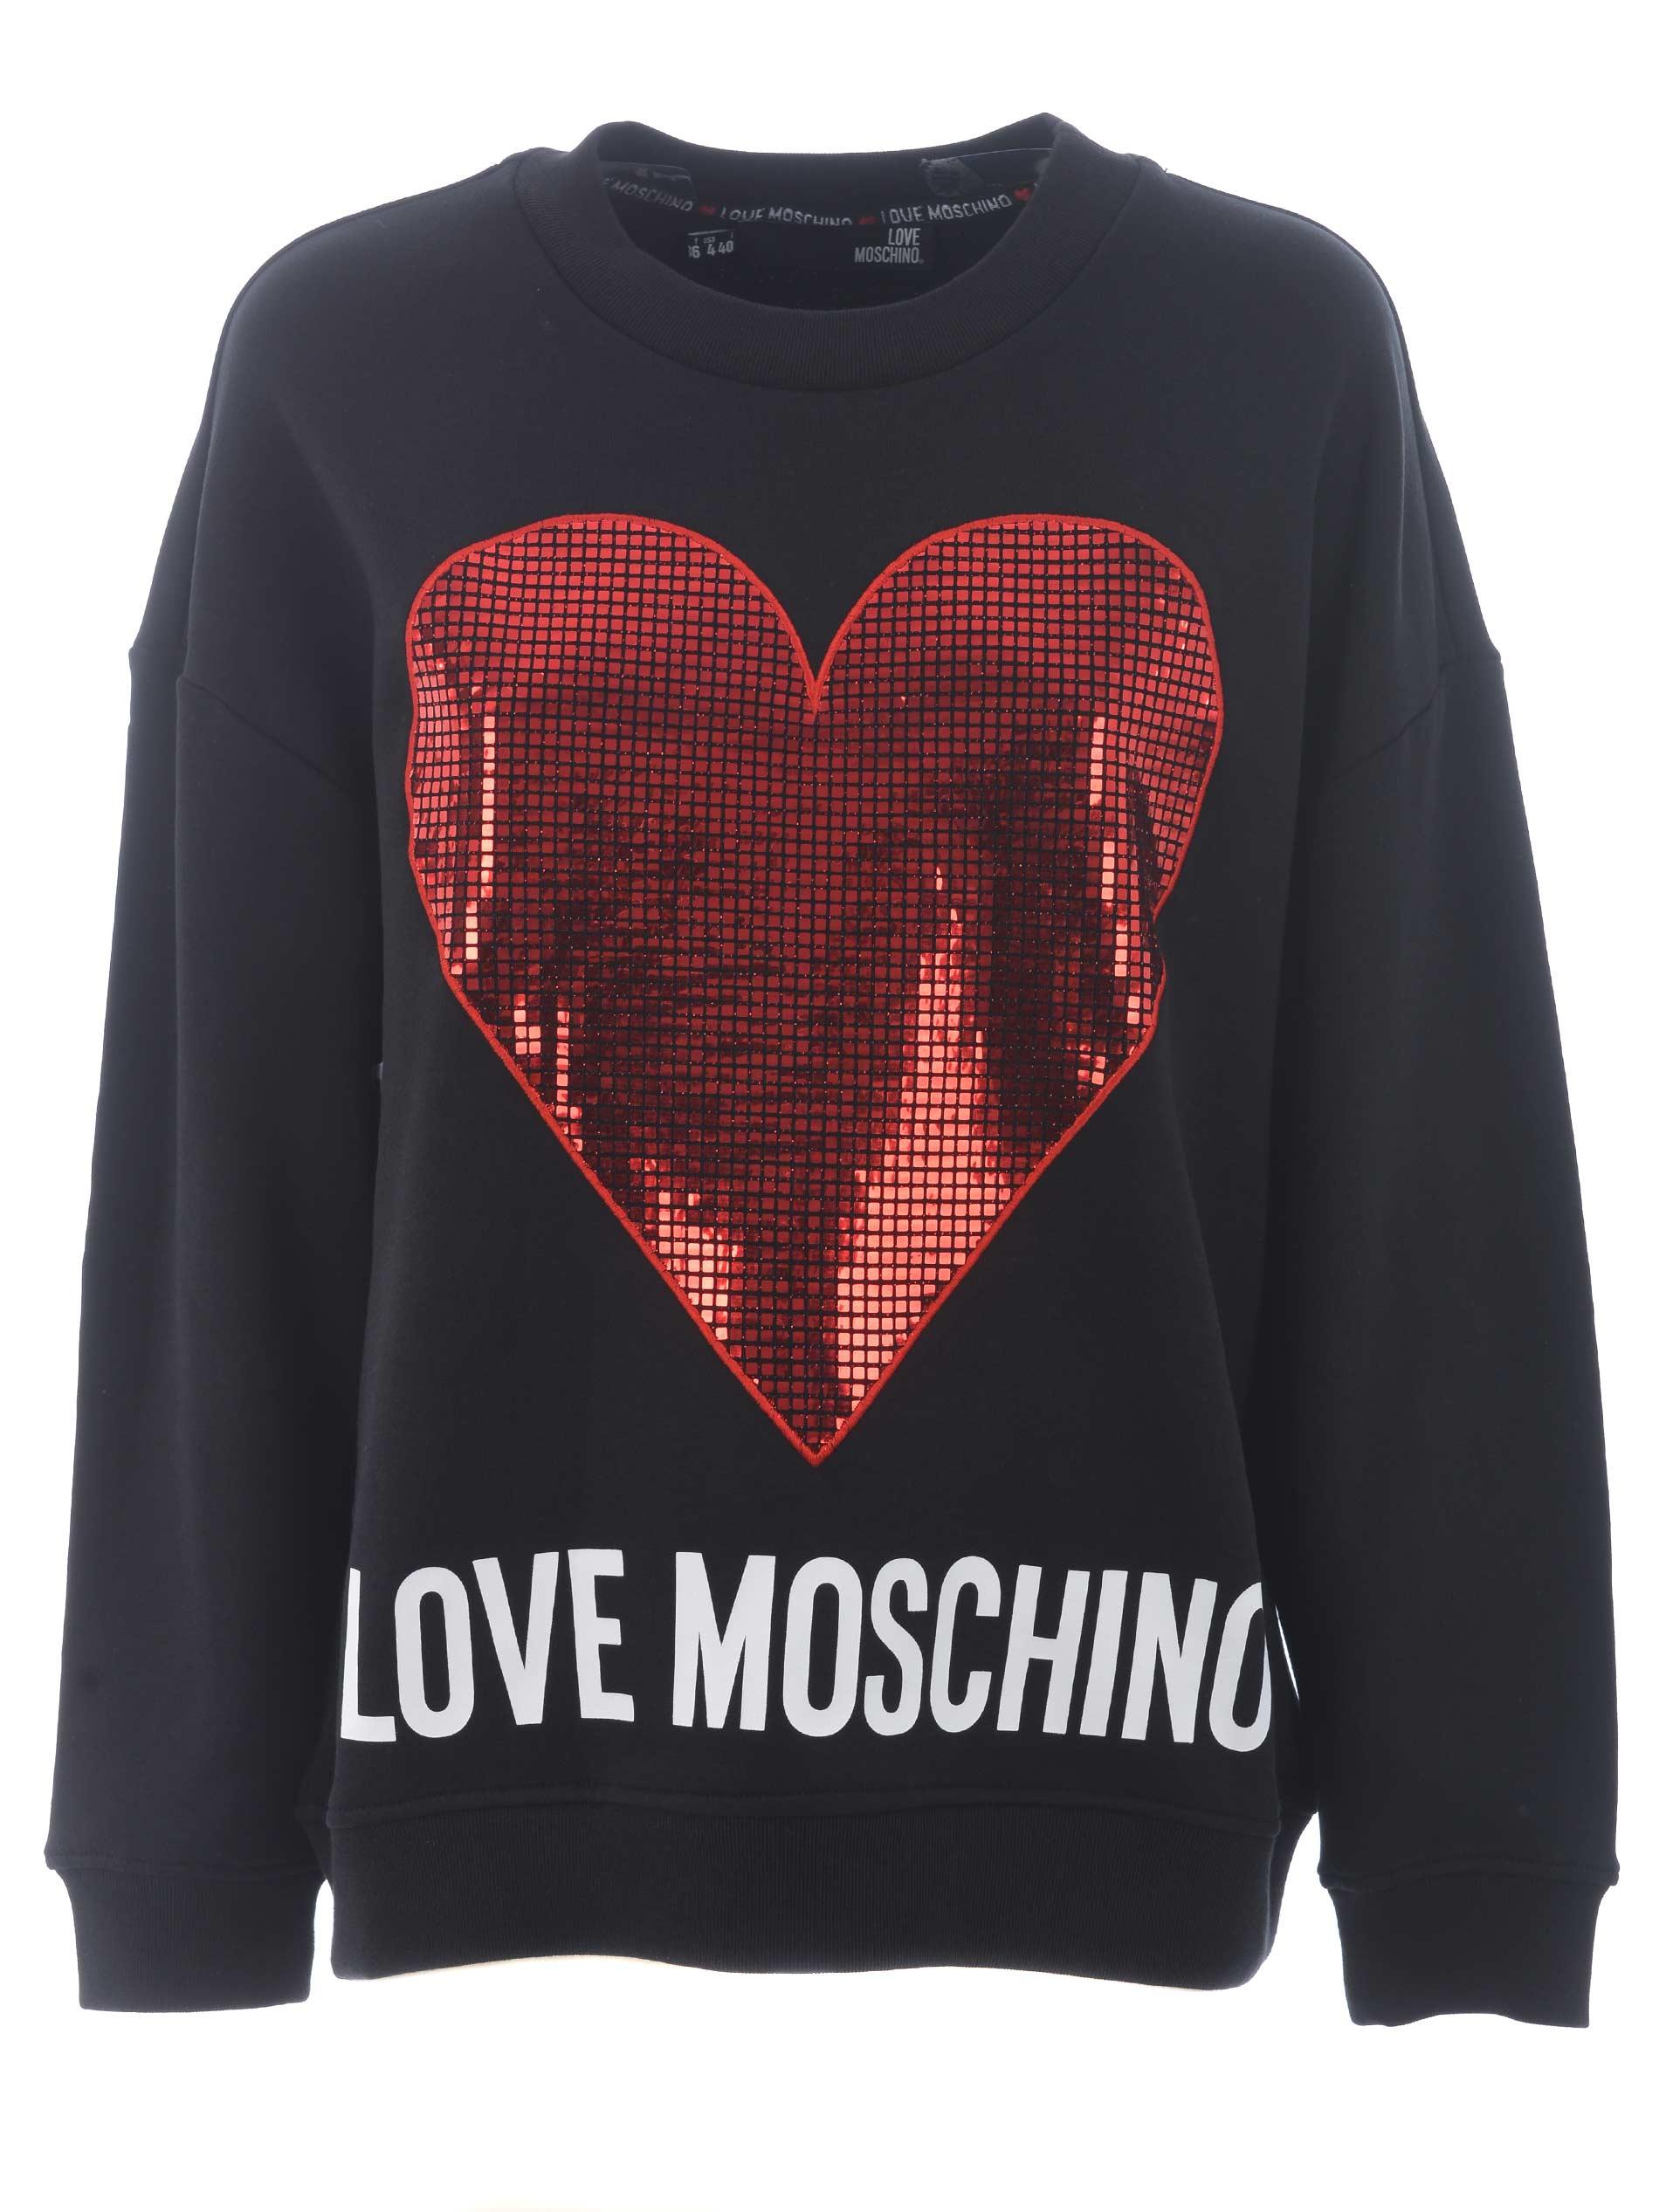 Love Moschino cotton sweatshirt